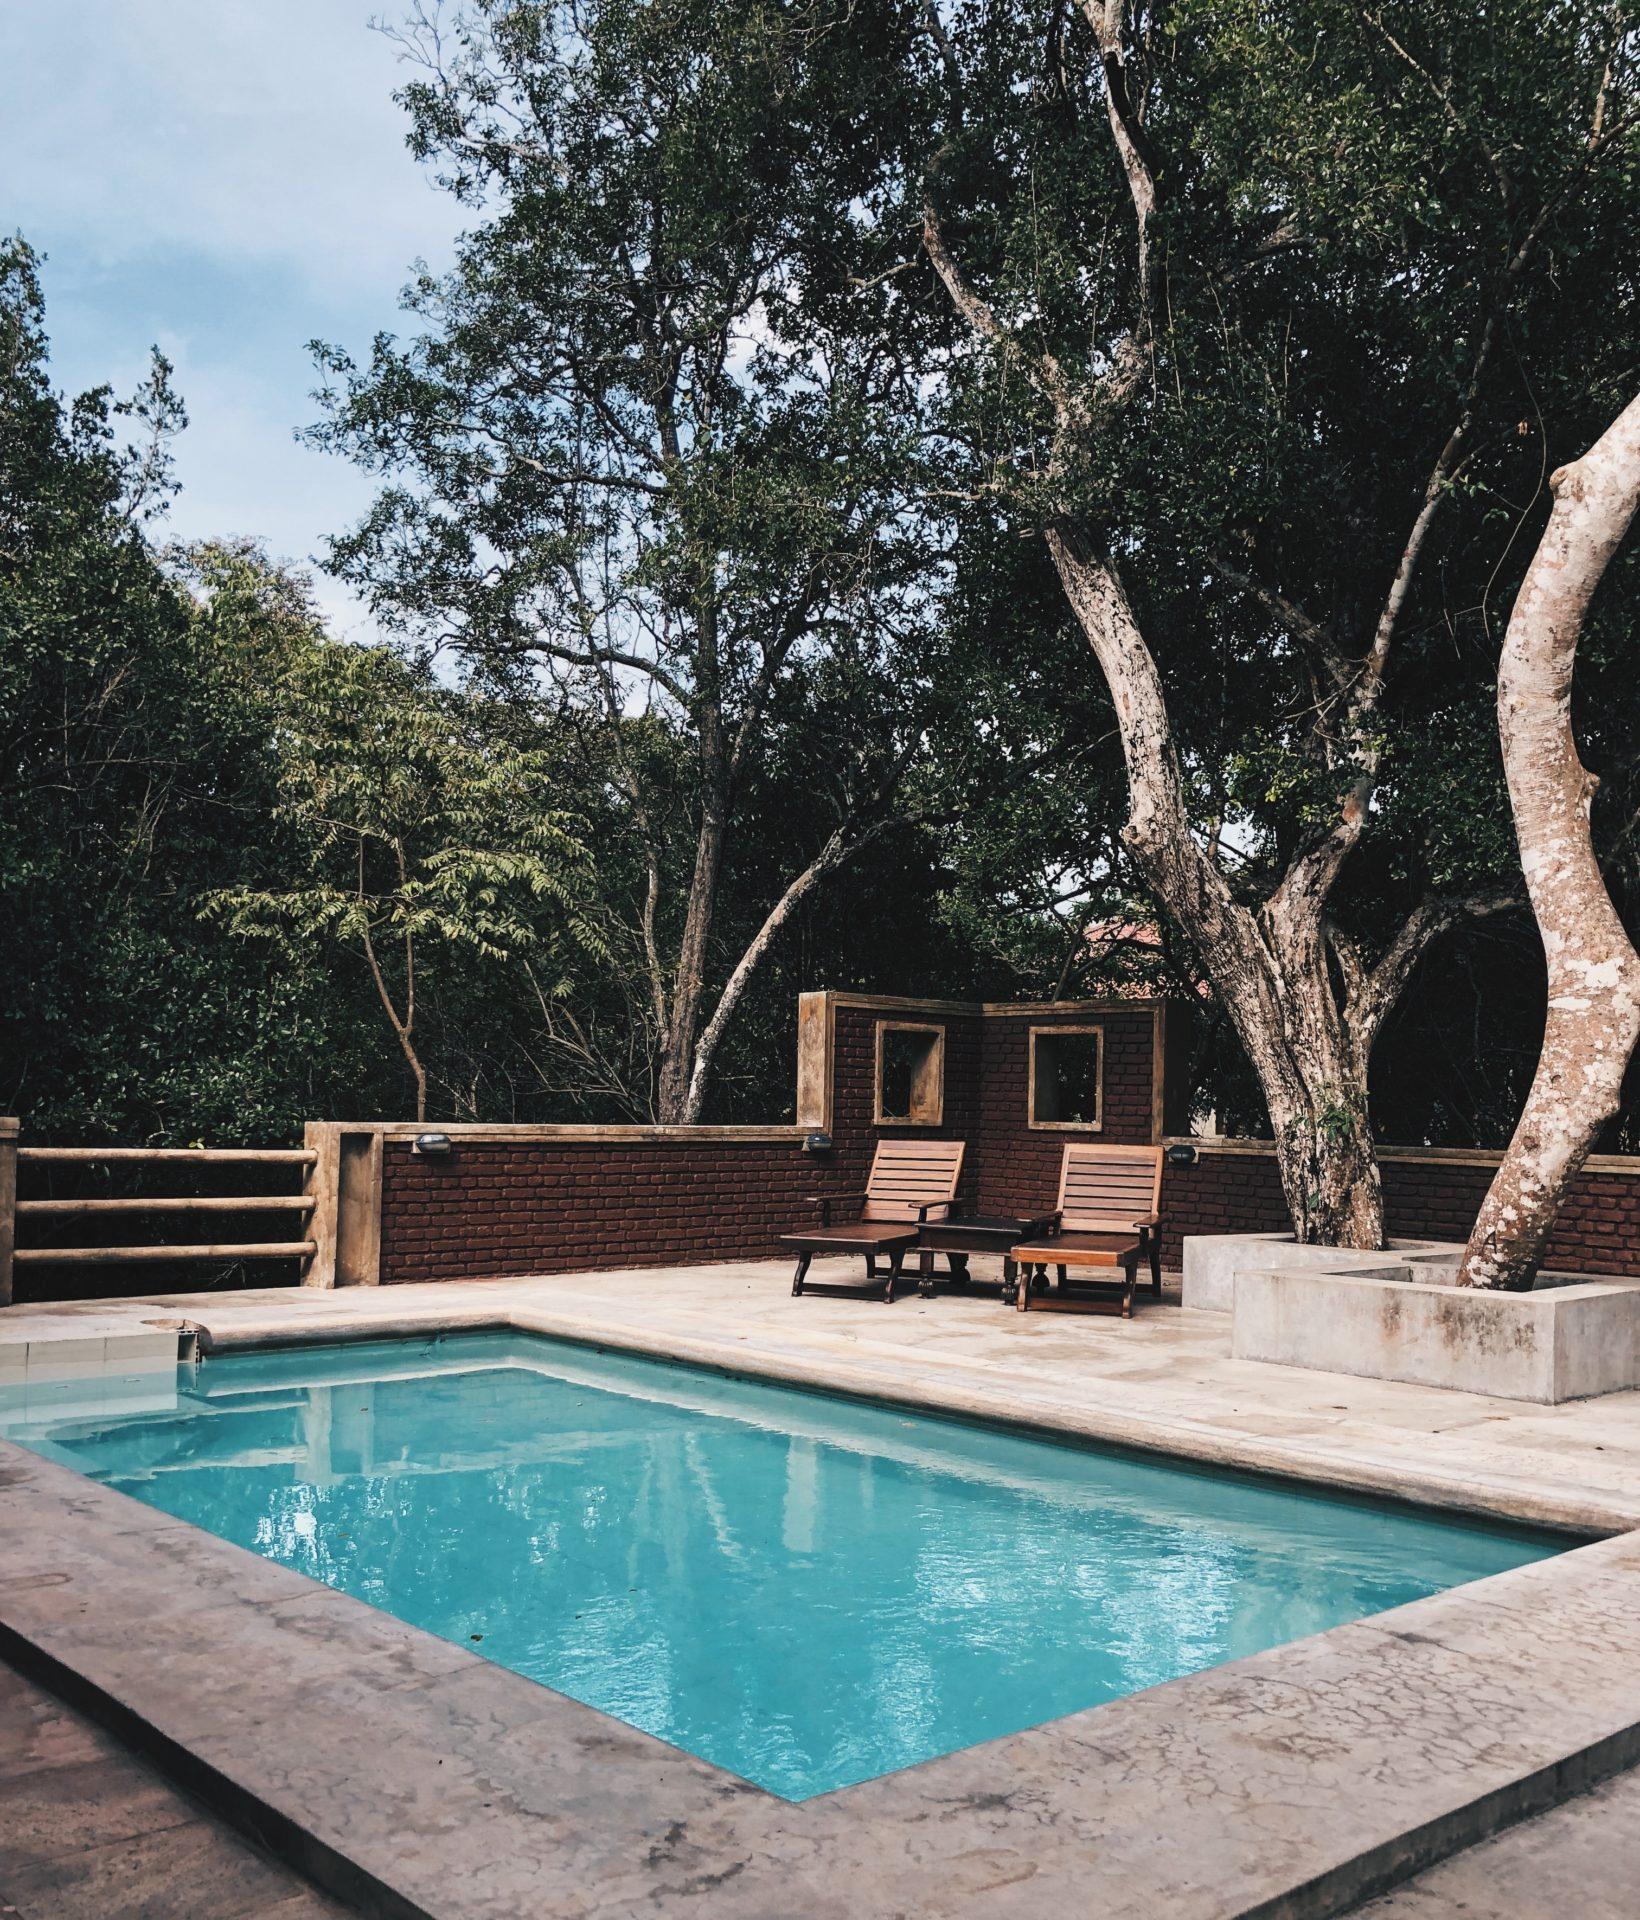 swimming pool in backyard with trees overhead